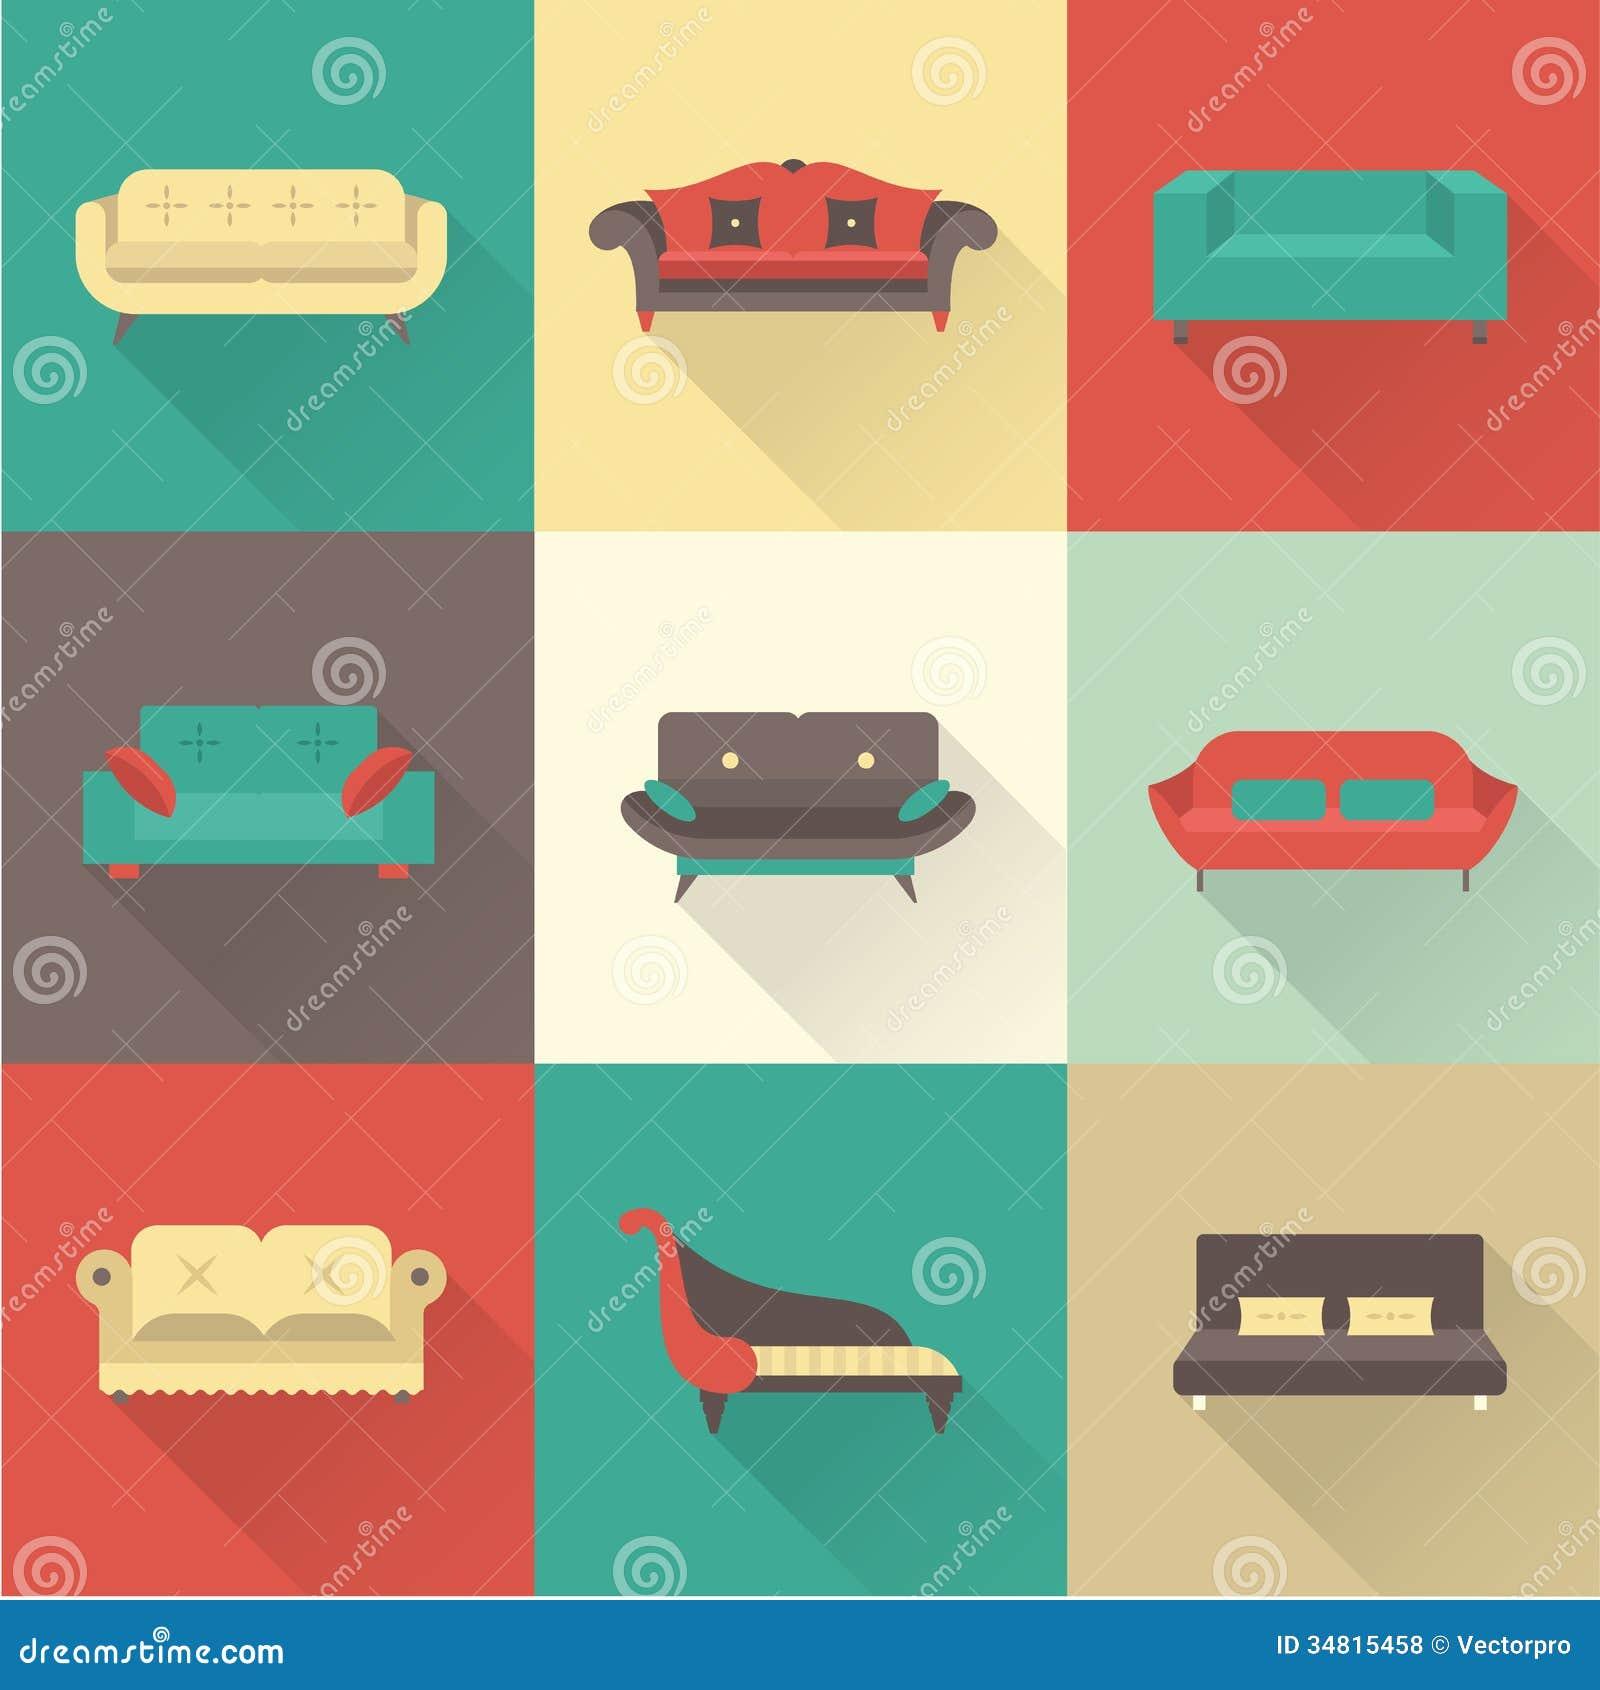 Vector Sofa Icons Royalty Free Stock Photos Image 34815458